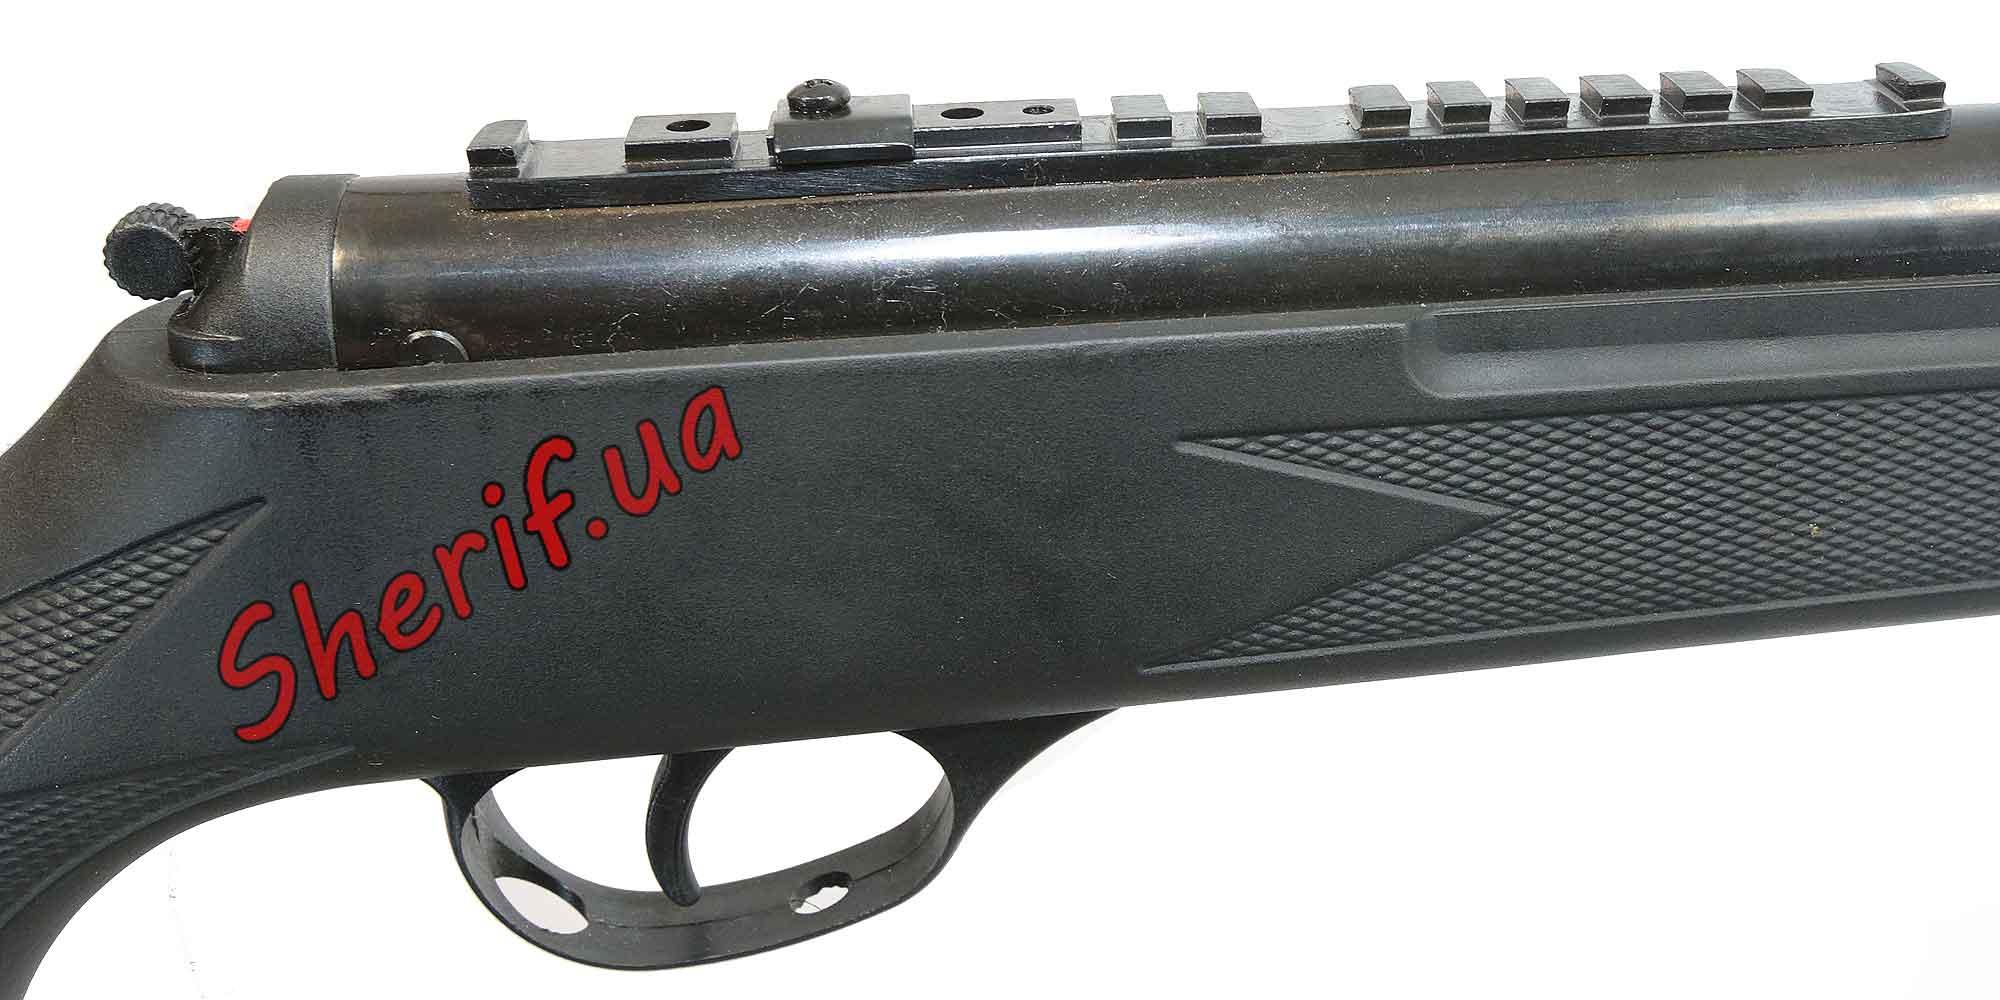 Walther talon magnum 4,5 cal havalı tüfek